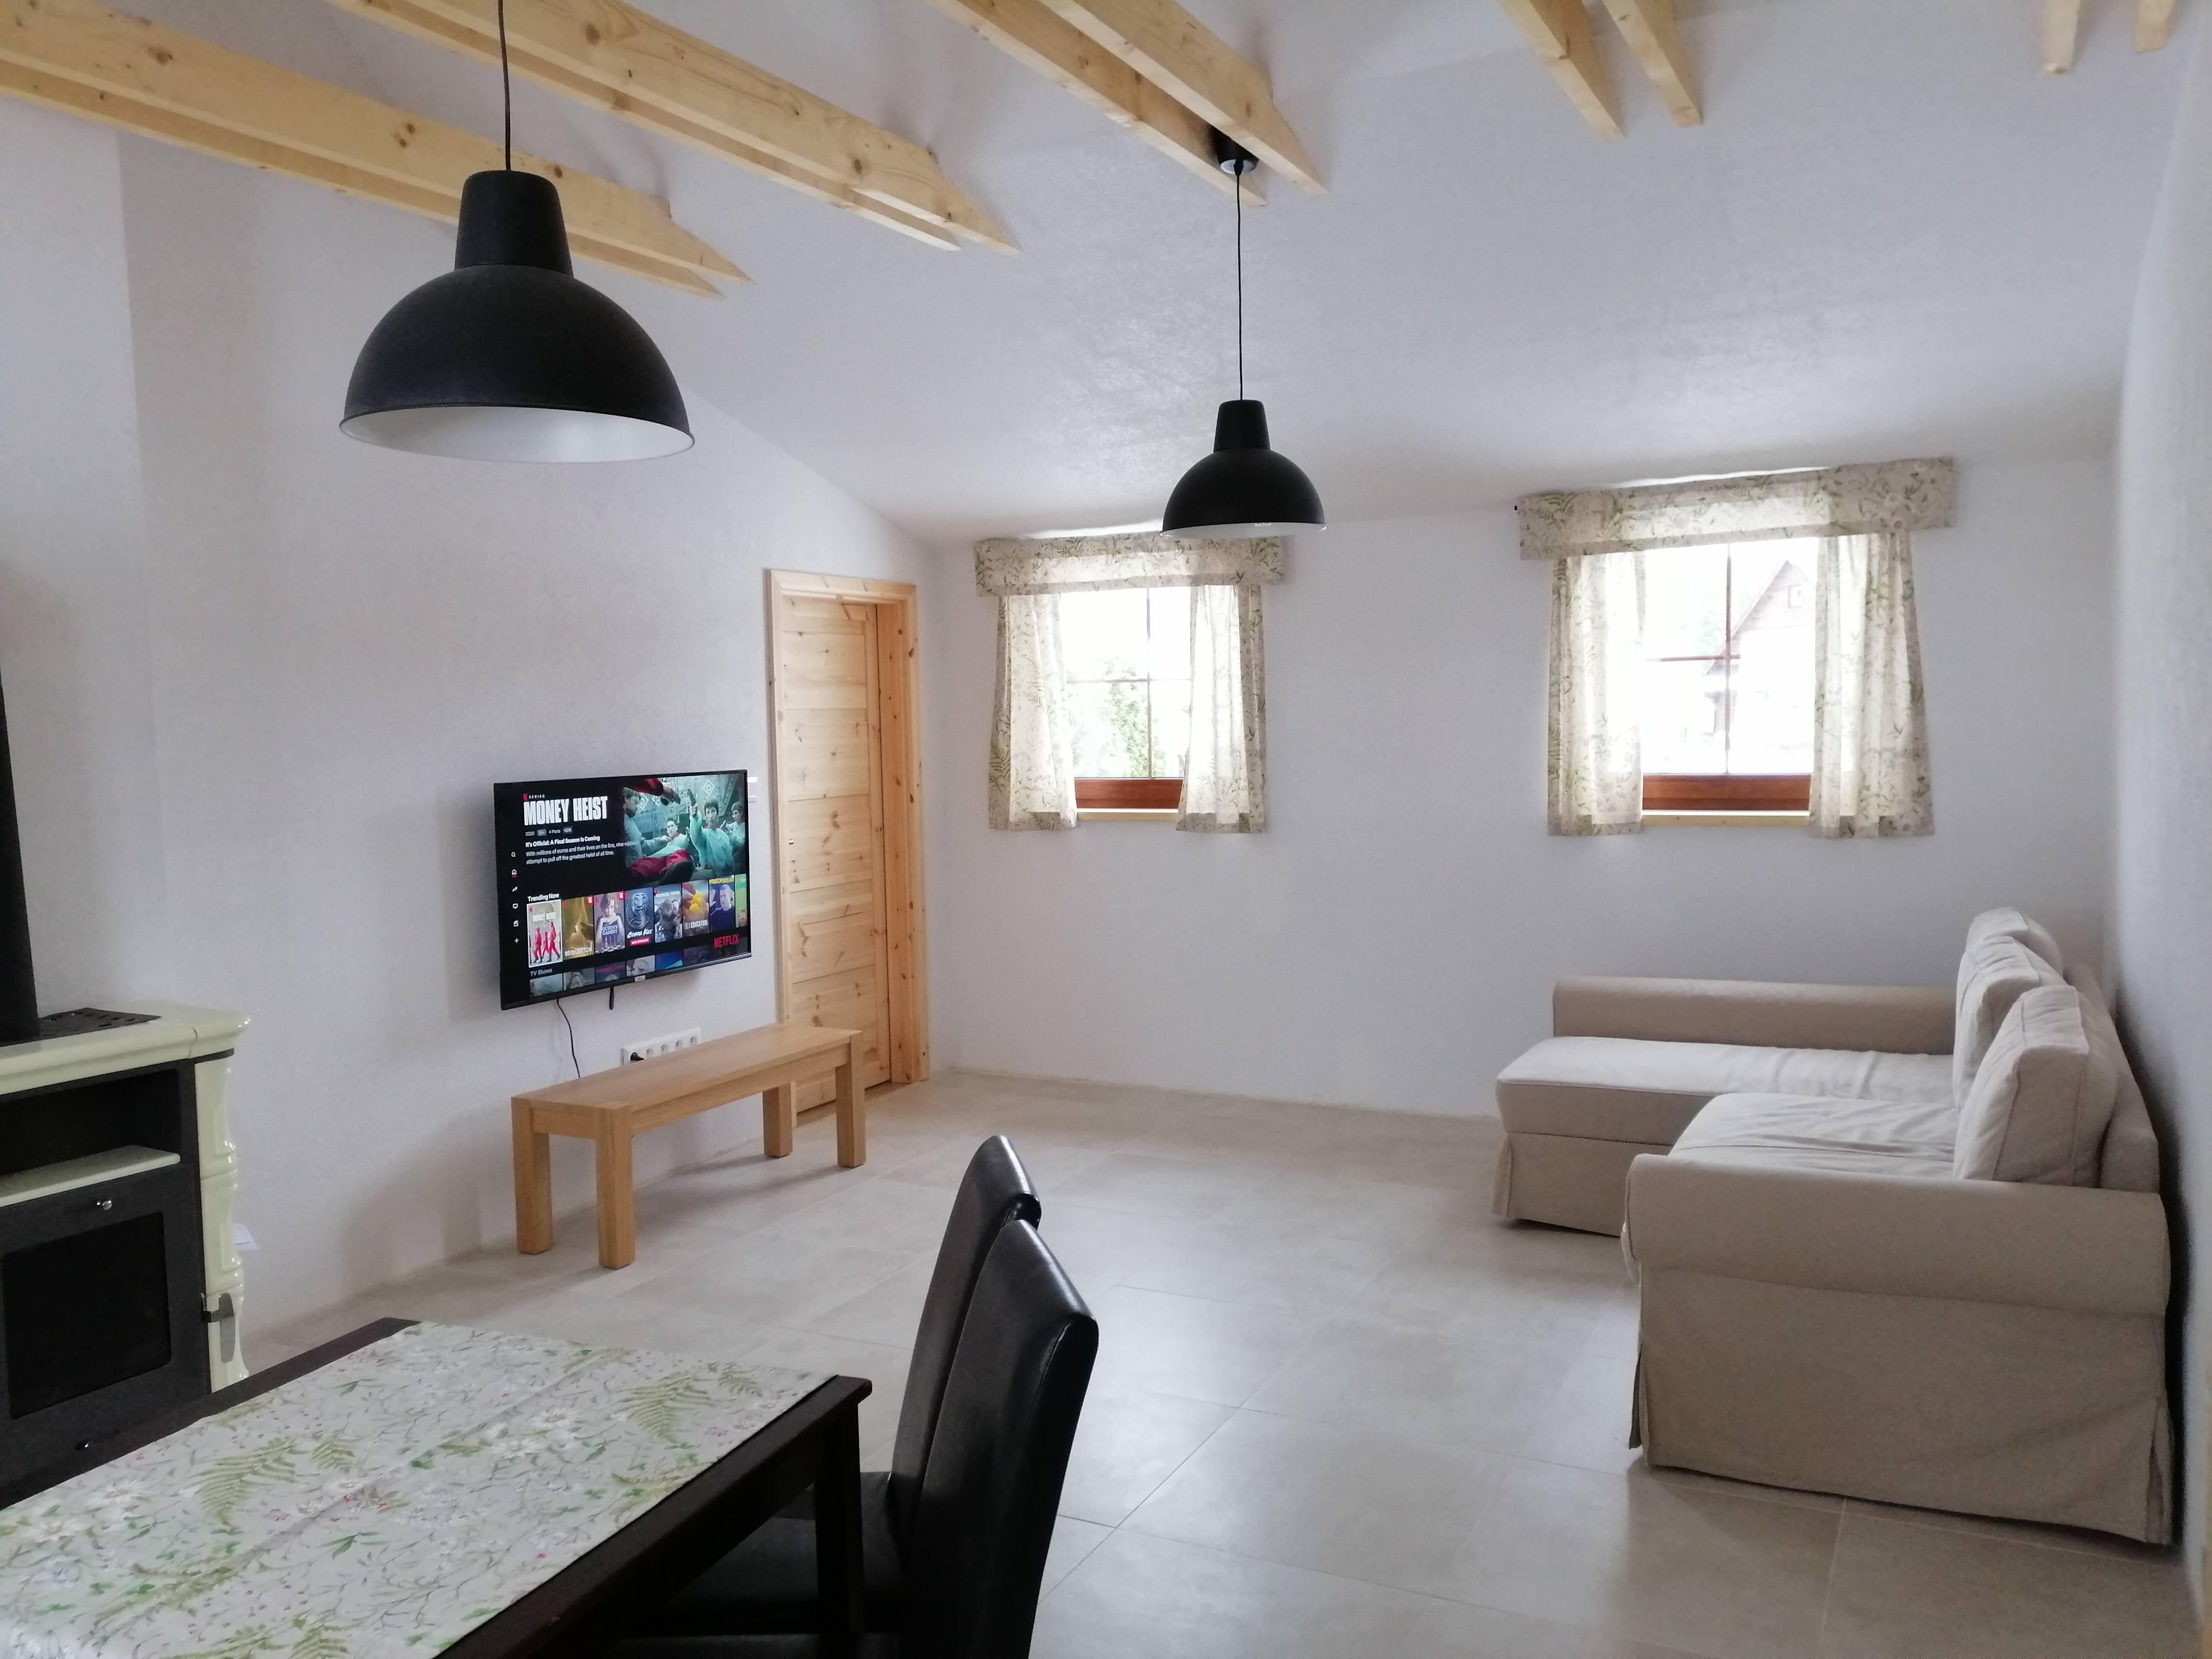 1618318473-Apartment-Chabenec-Livingroom-03.jpg